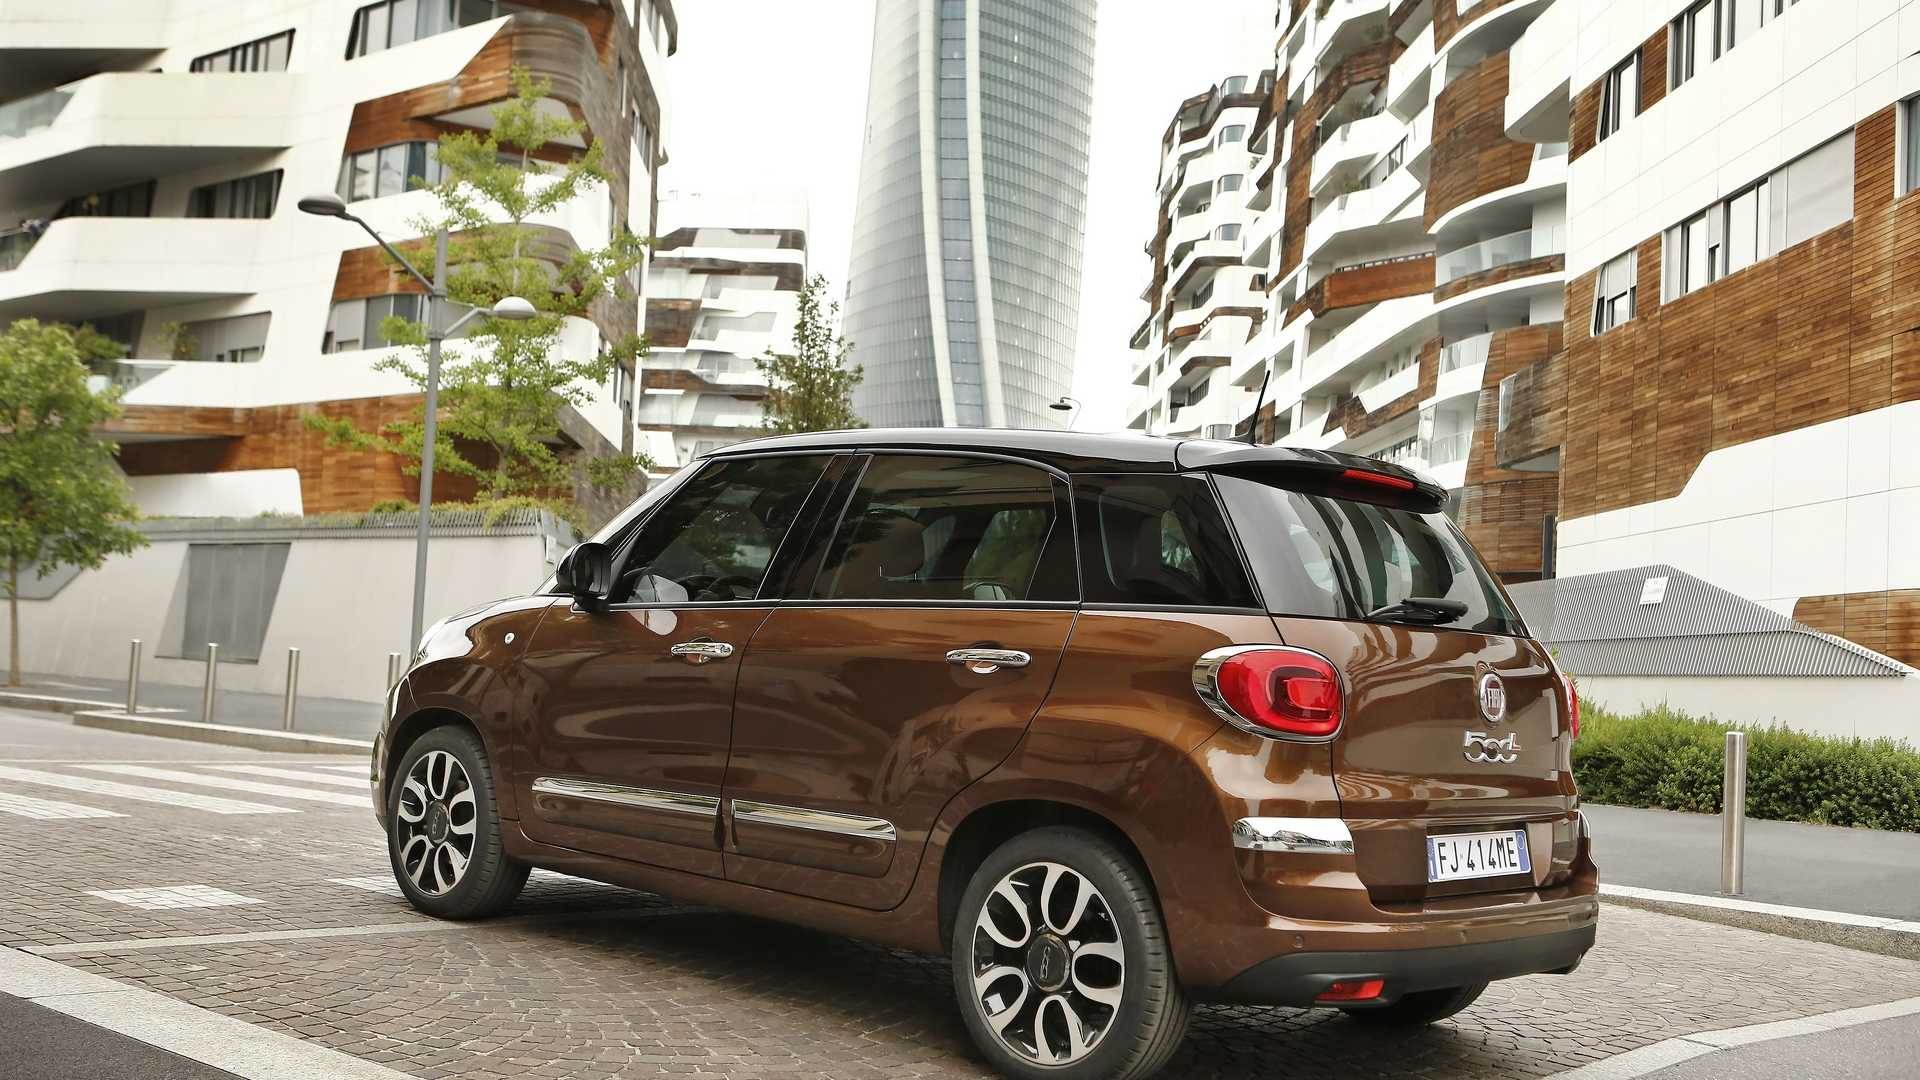 2018_Fiat_500L_facelift_10